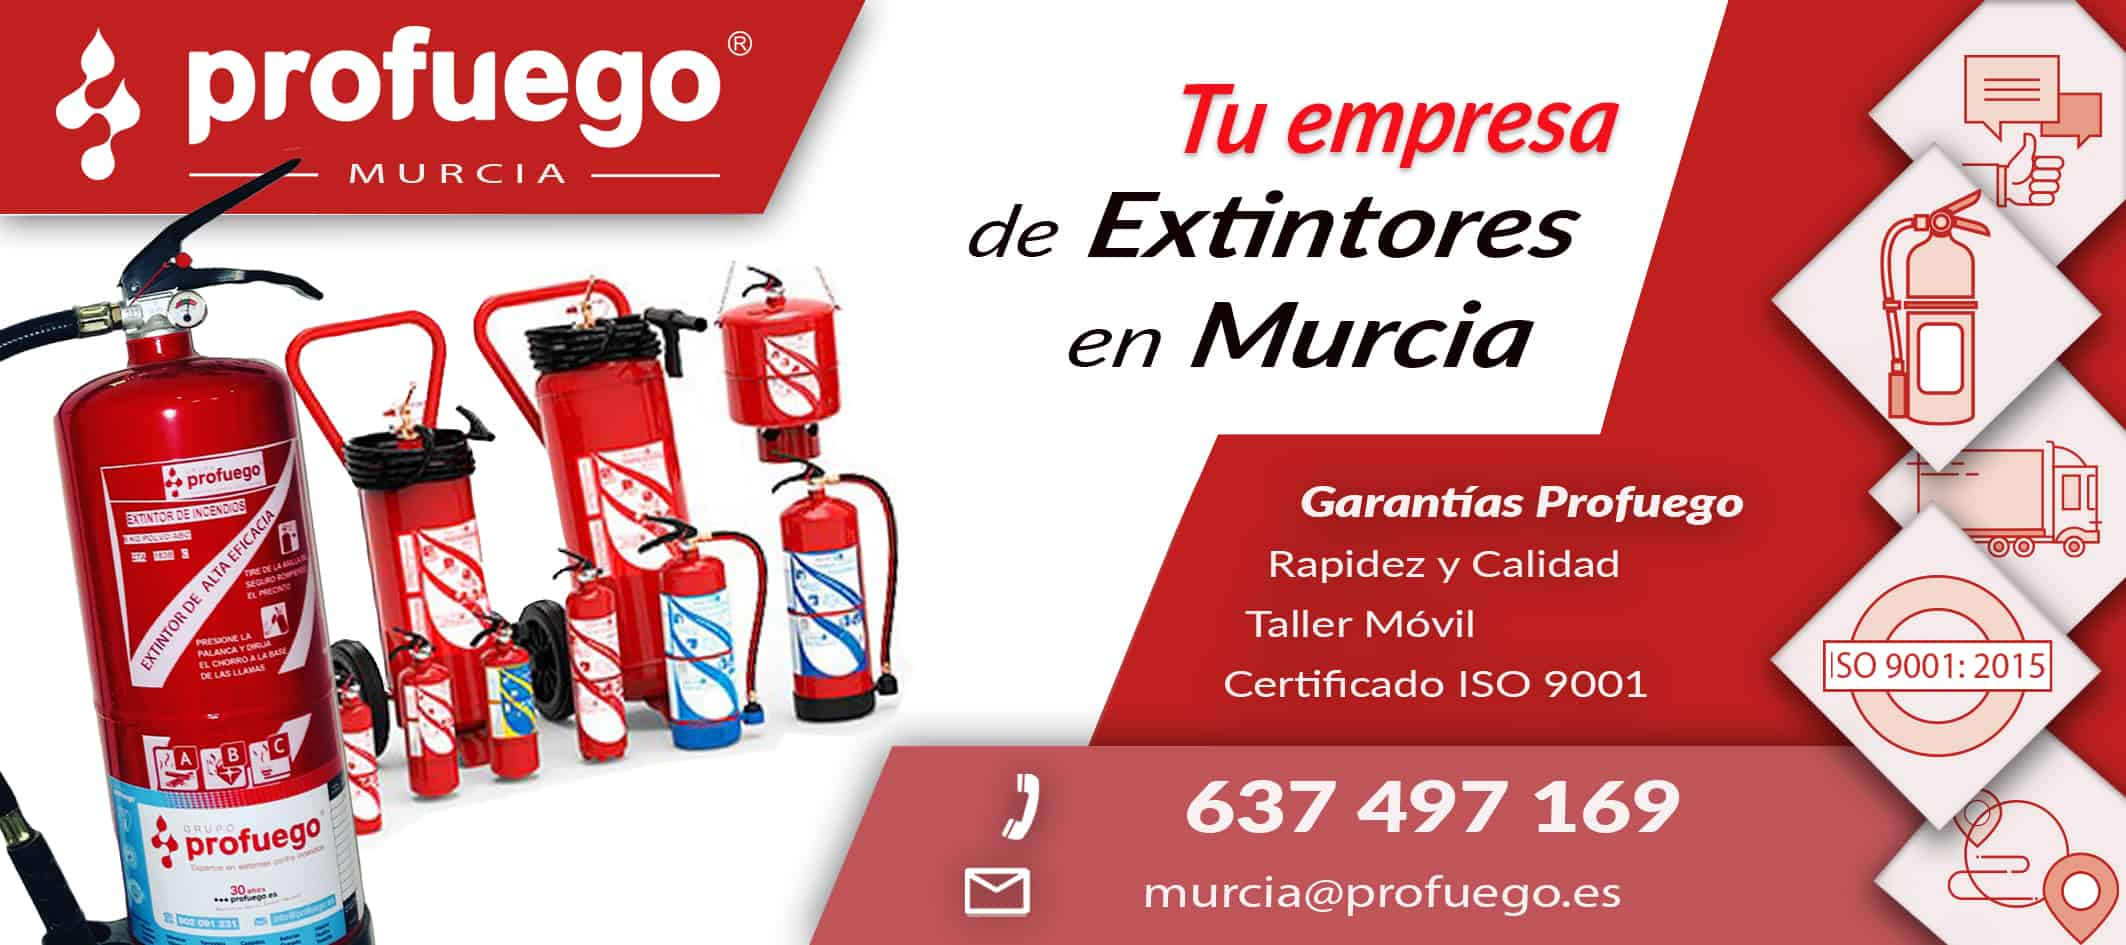 extintores murcia